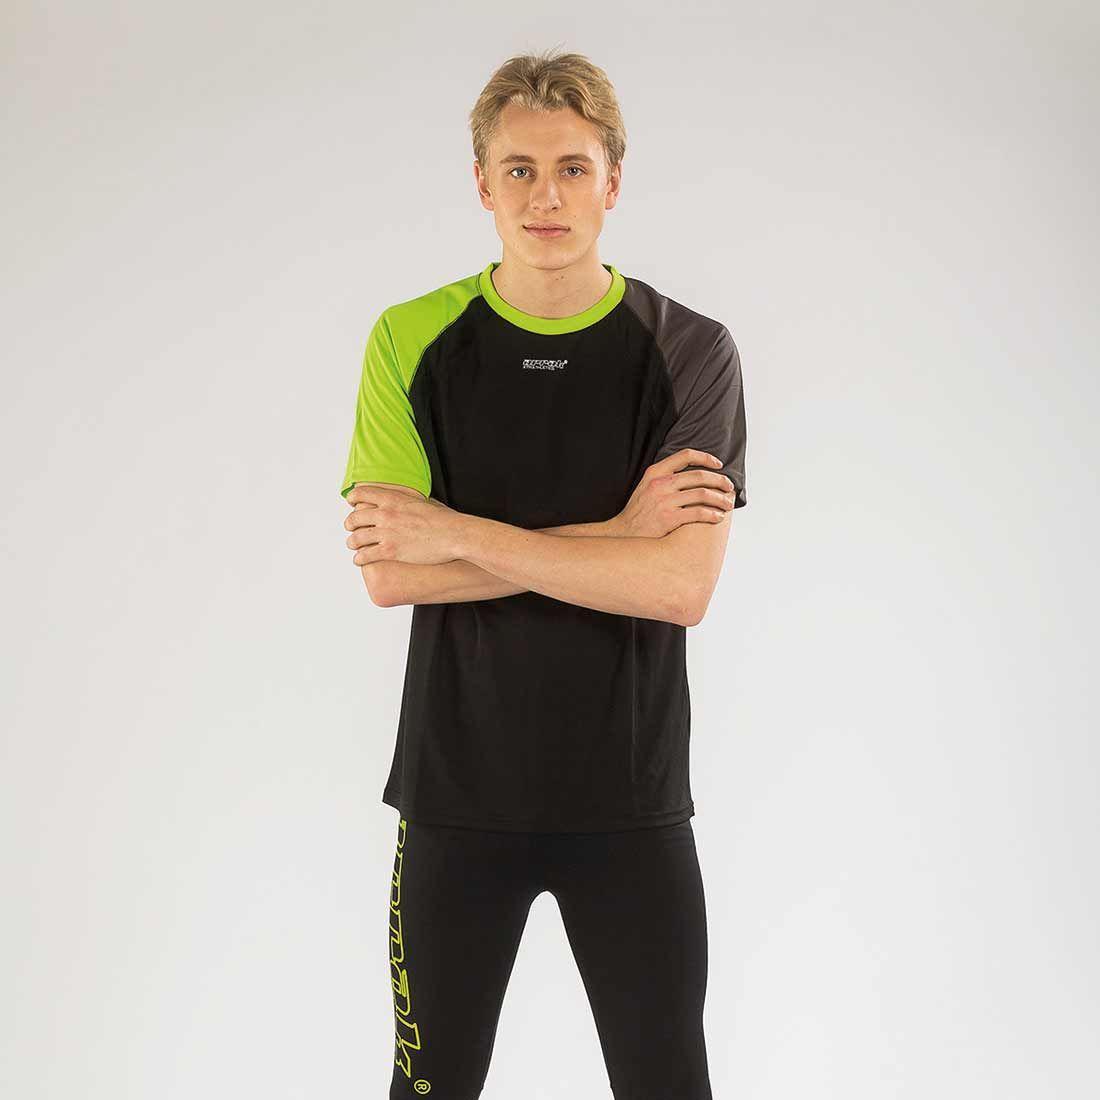 Arrak Function Tee Athletic Black/Green S